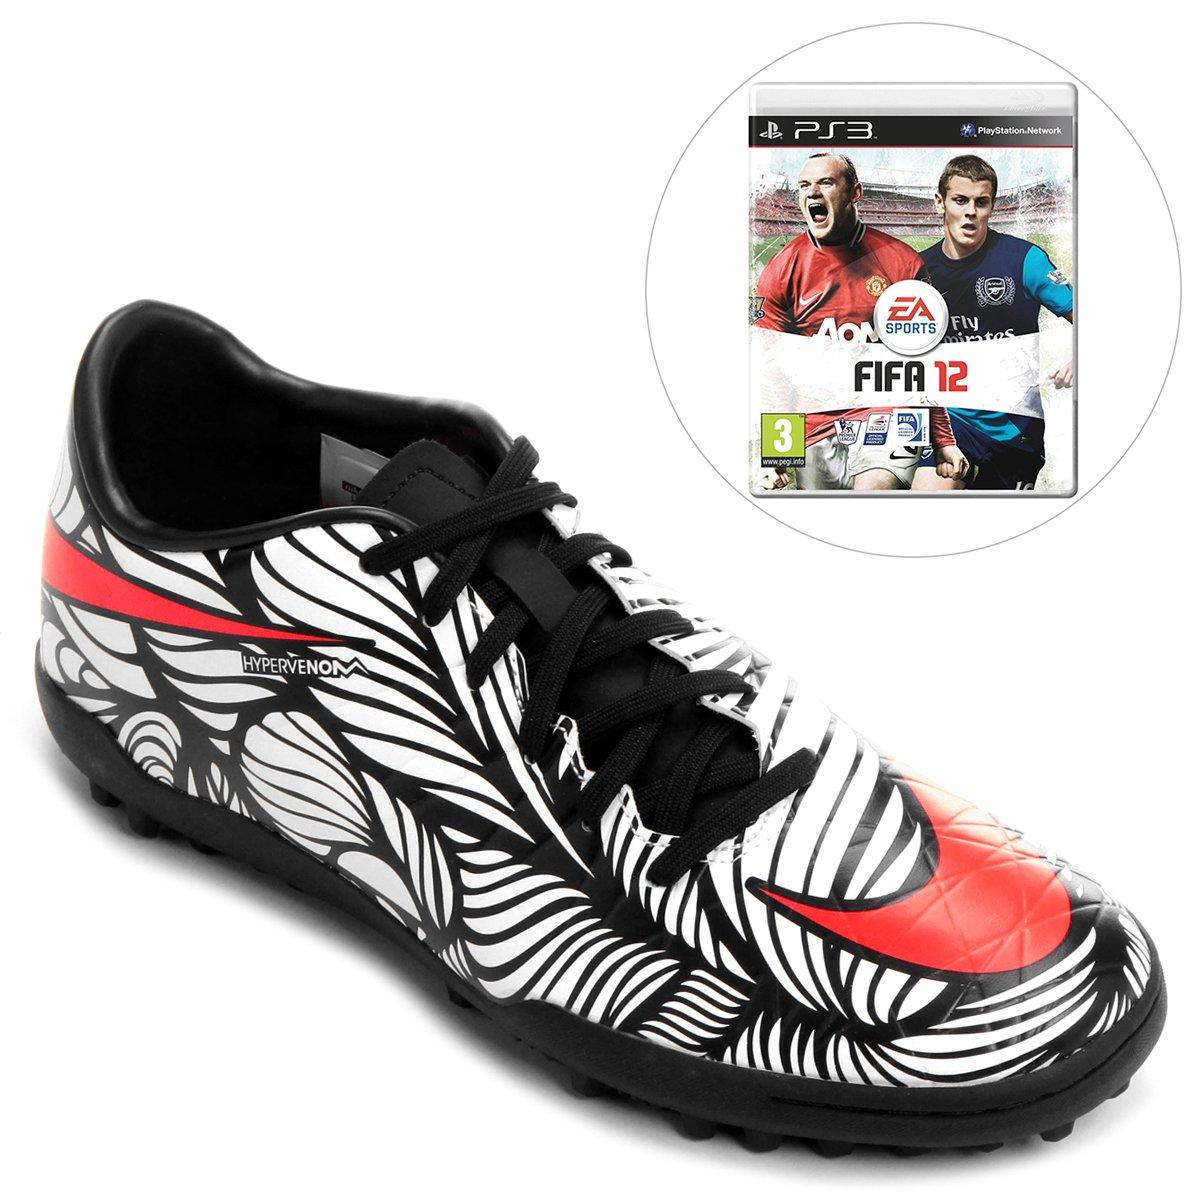 407b6bf5468e6 Chuteira Nike Hypervenom Phelon II NJR TF Society + Jogo FIFA Soccer 12 PS3  - Compre Agora | Netshoes